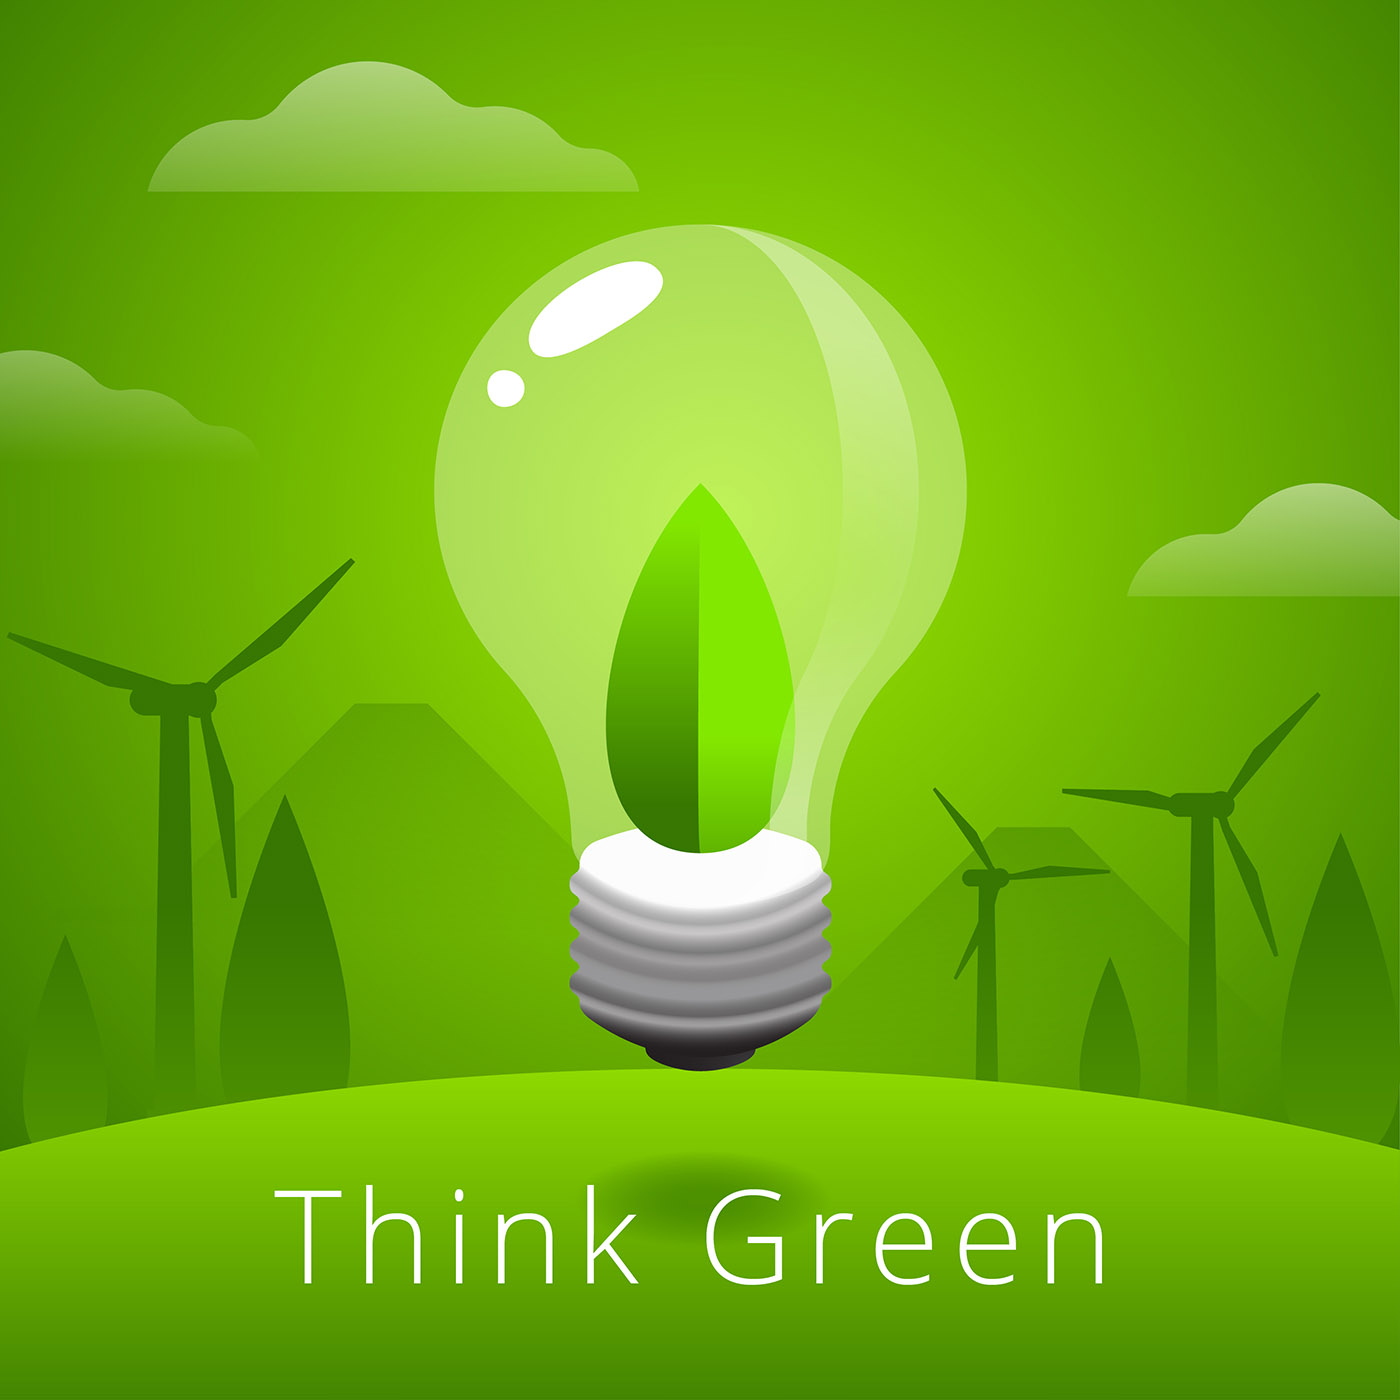 Think Green Vector Download Free Vector Art Stock